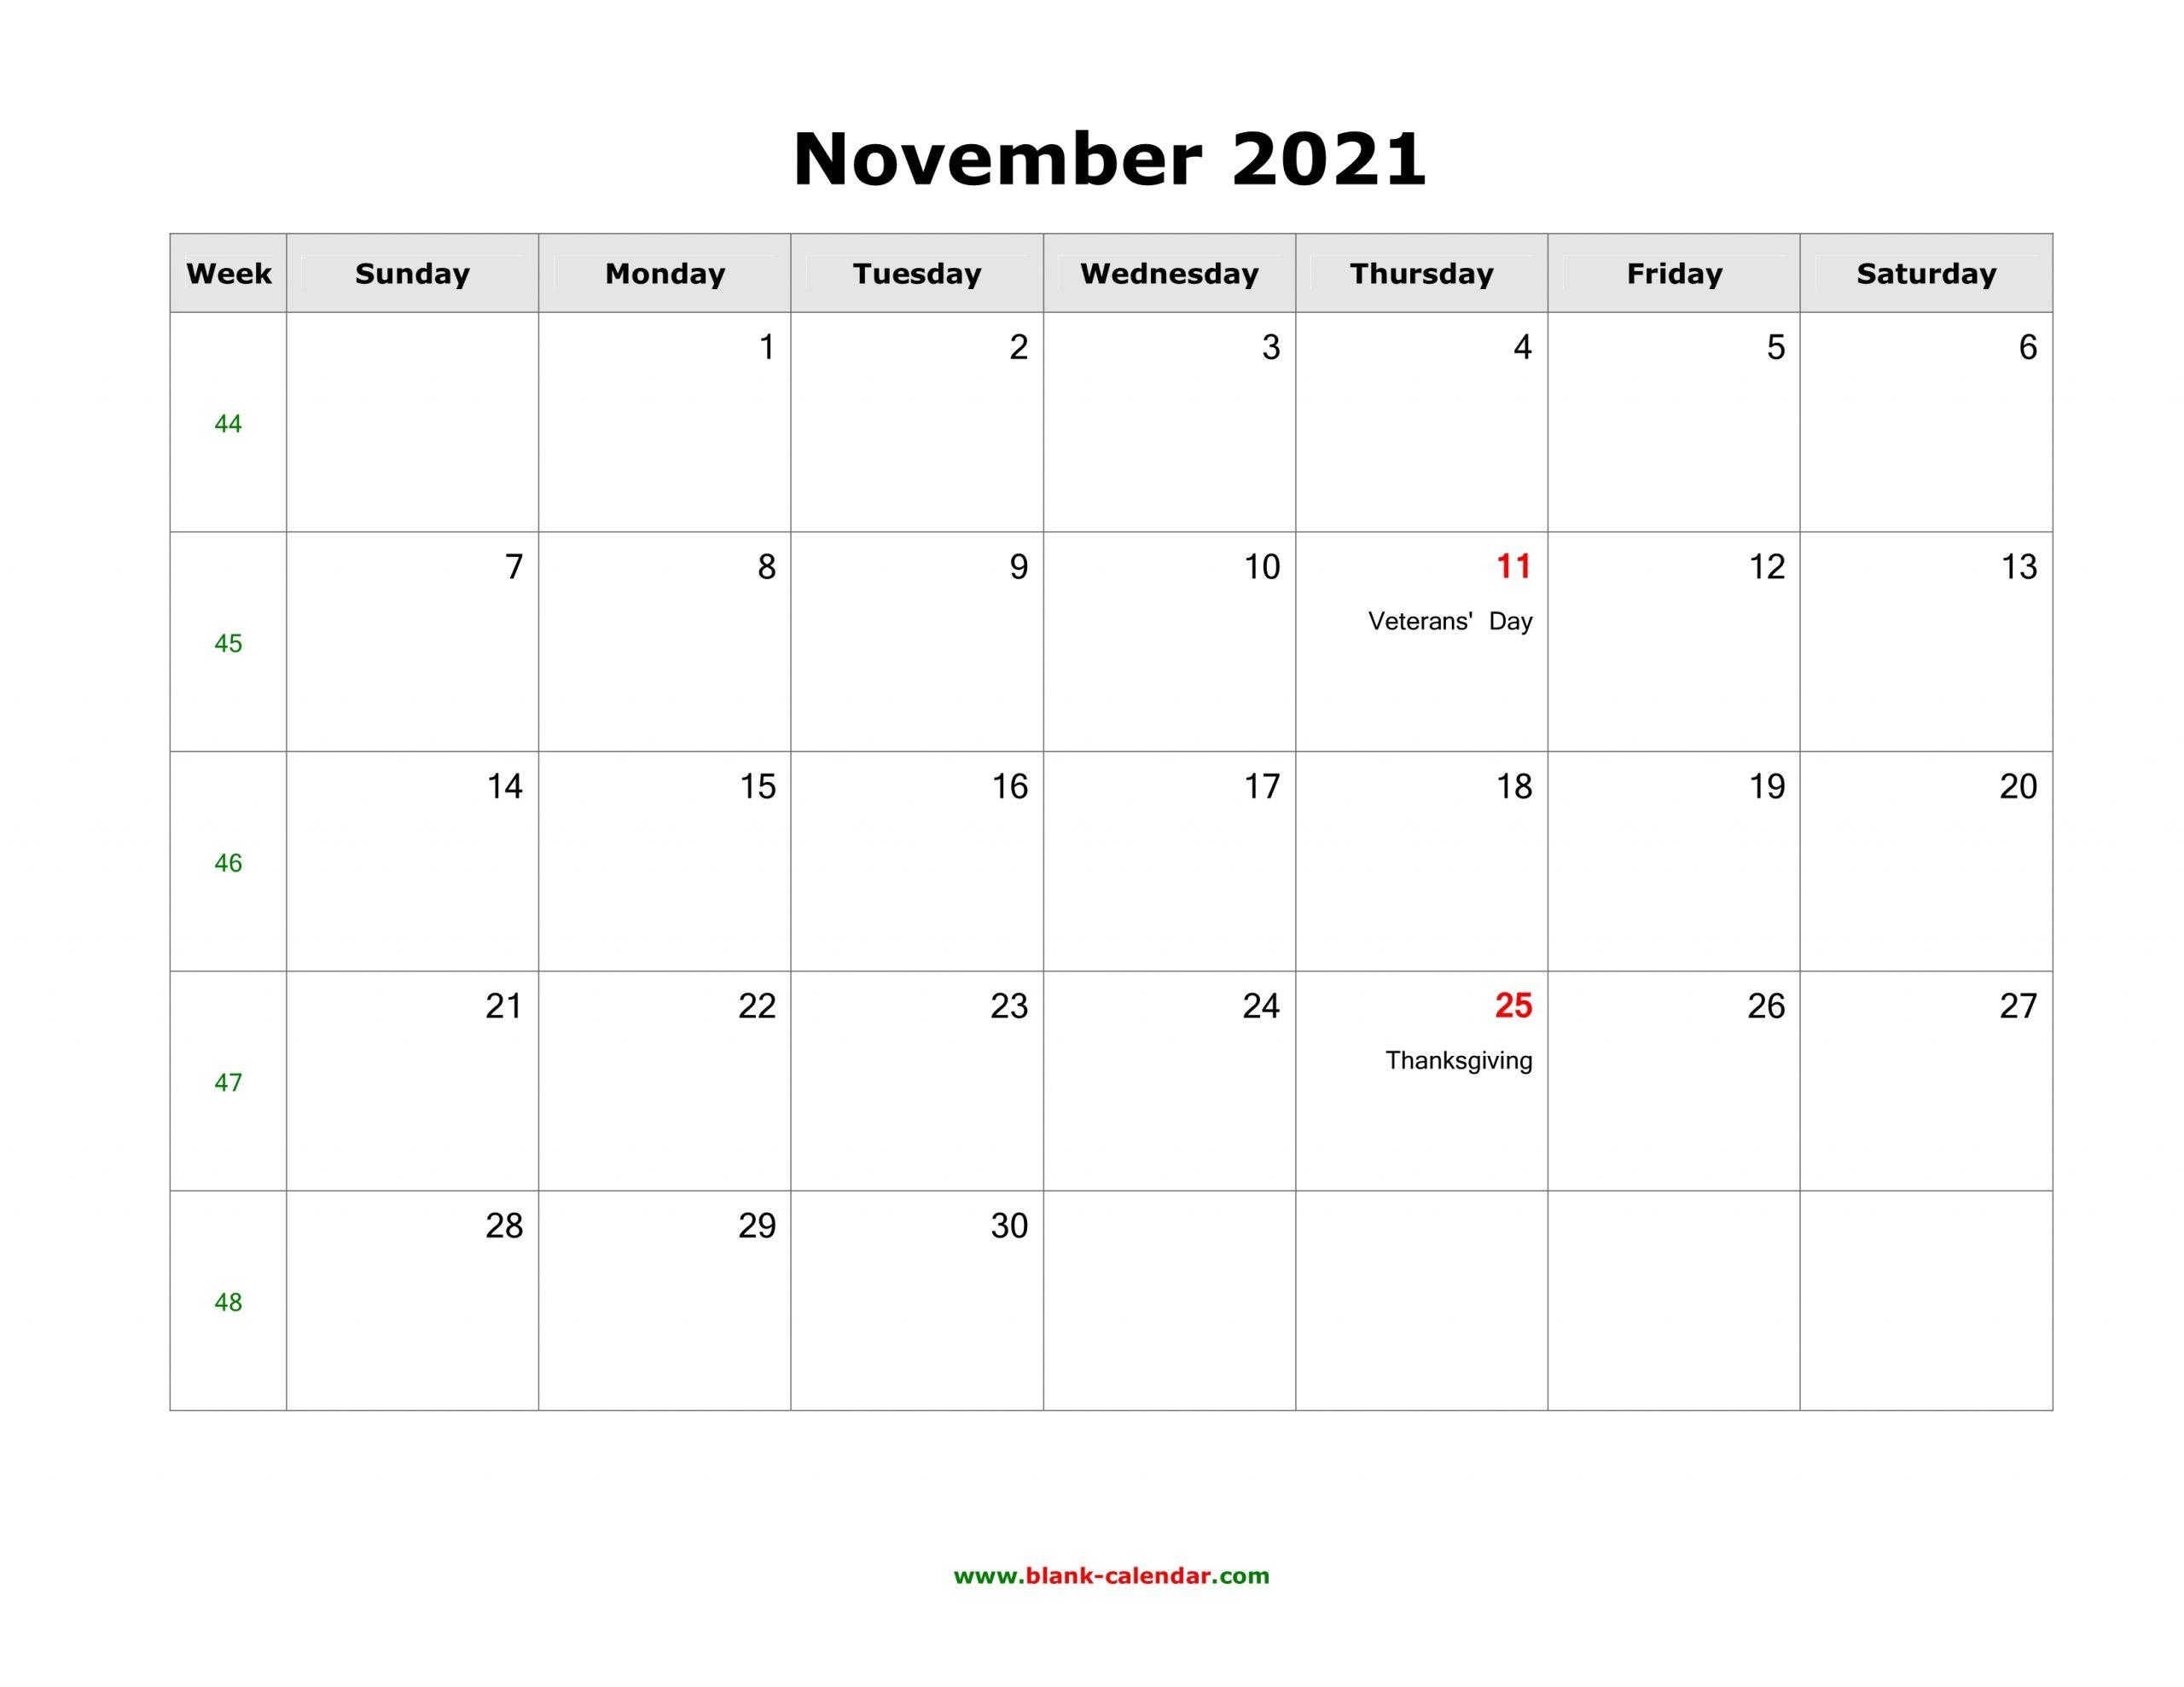 November 2021 Blank Calendar | Free Download Calendar Templates